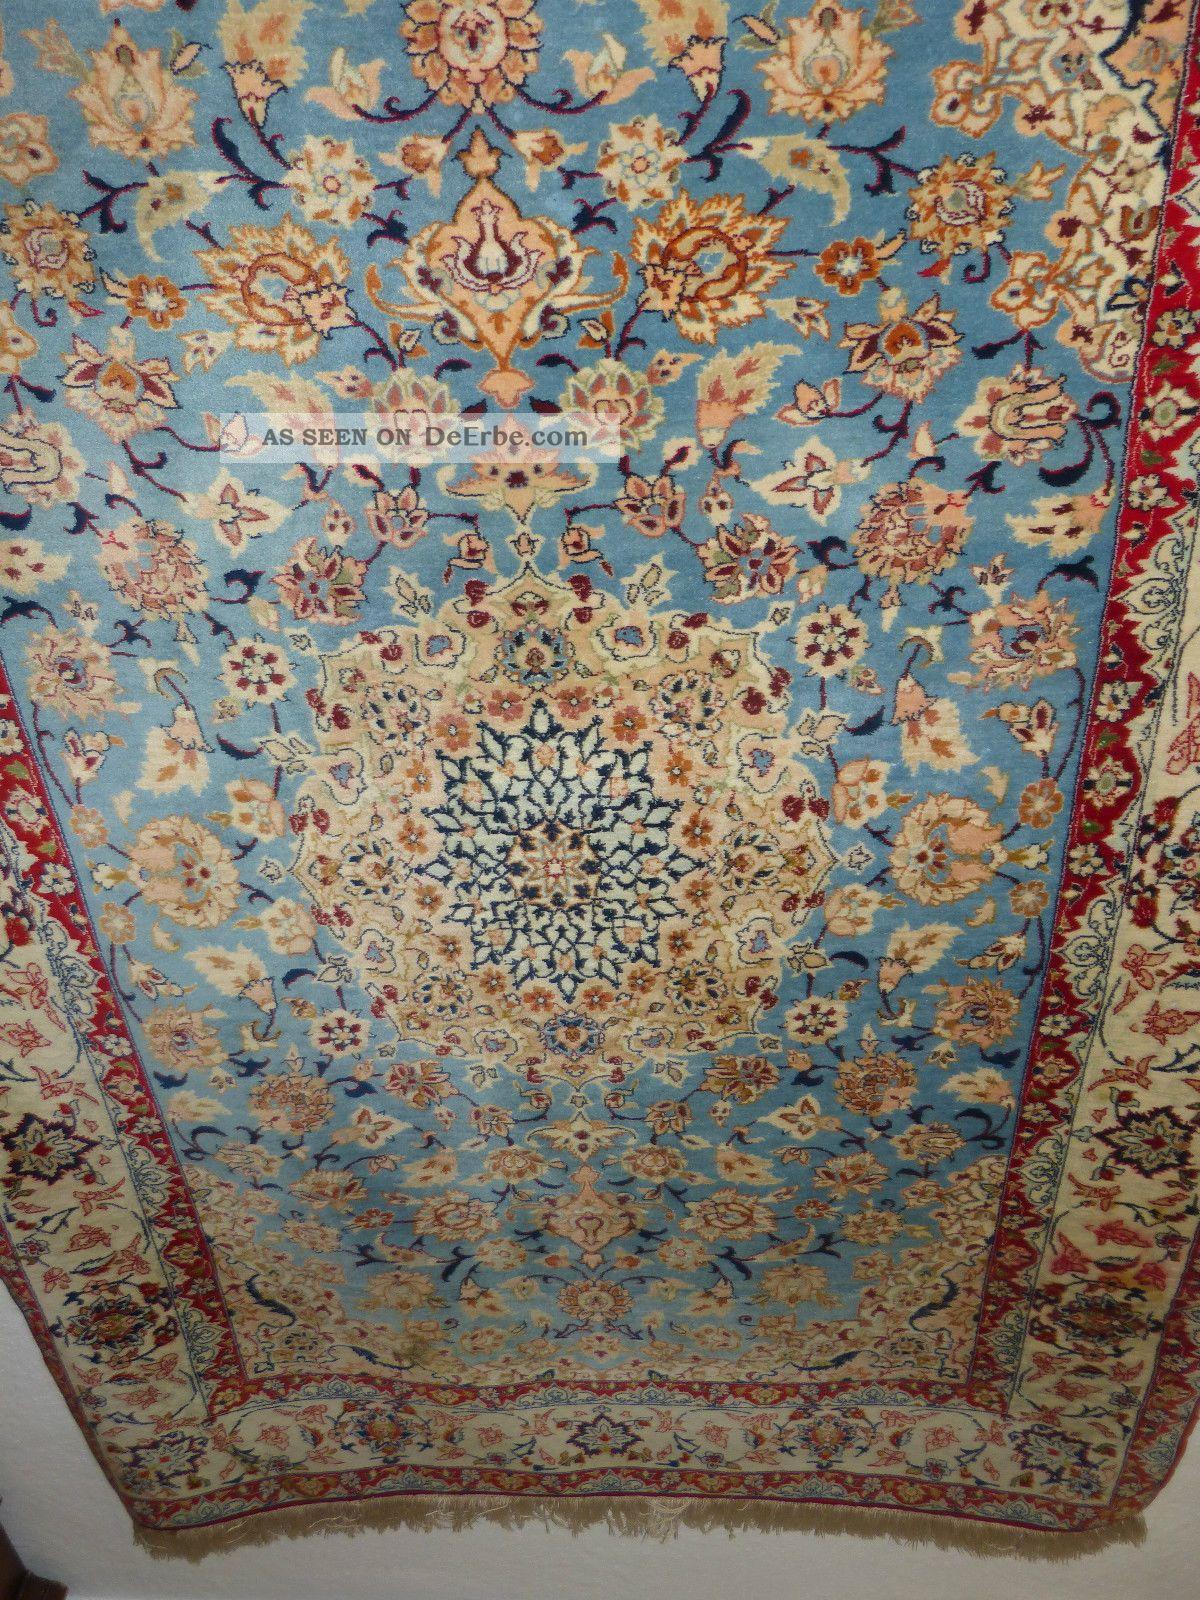 Orientteppich antik  Orientteppich, Perserteppich Antik